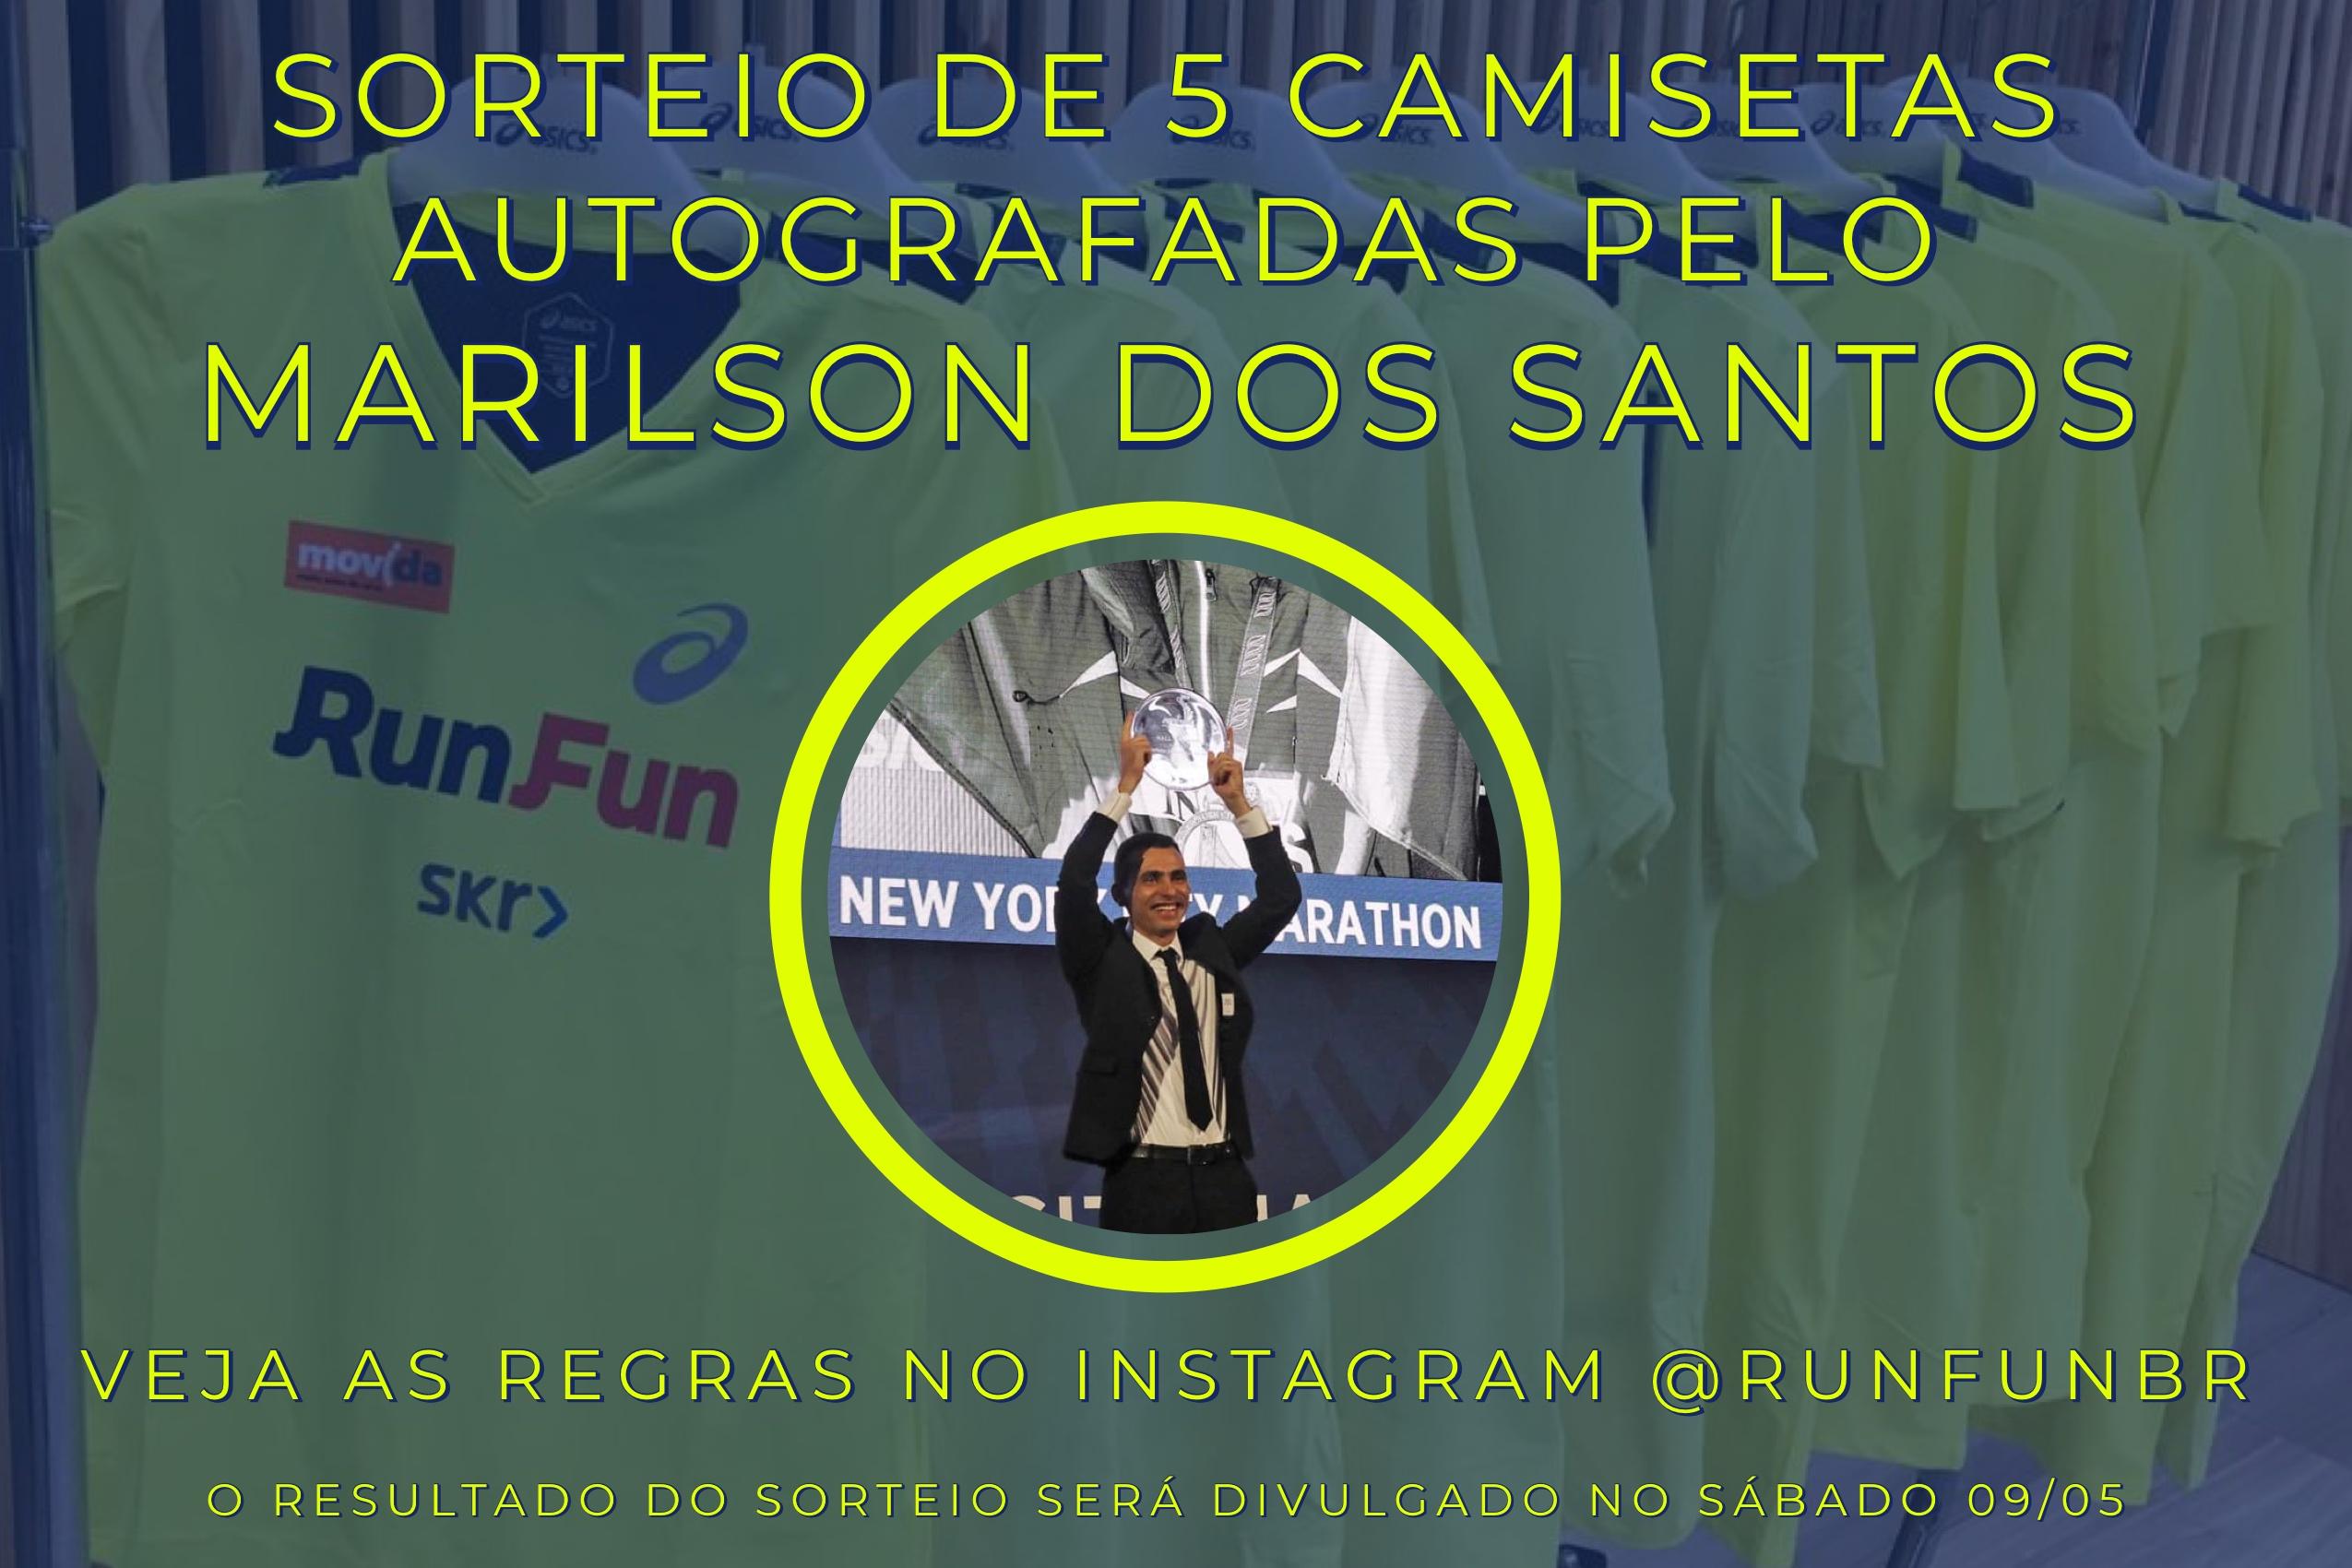 Sorteio-5-camisetas-autografadas-Marilson-dos-Santos-09-05-2020